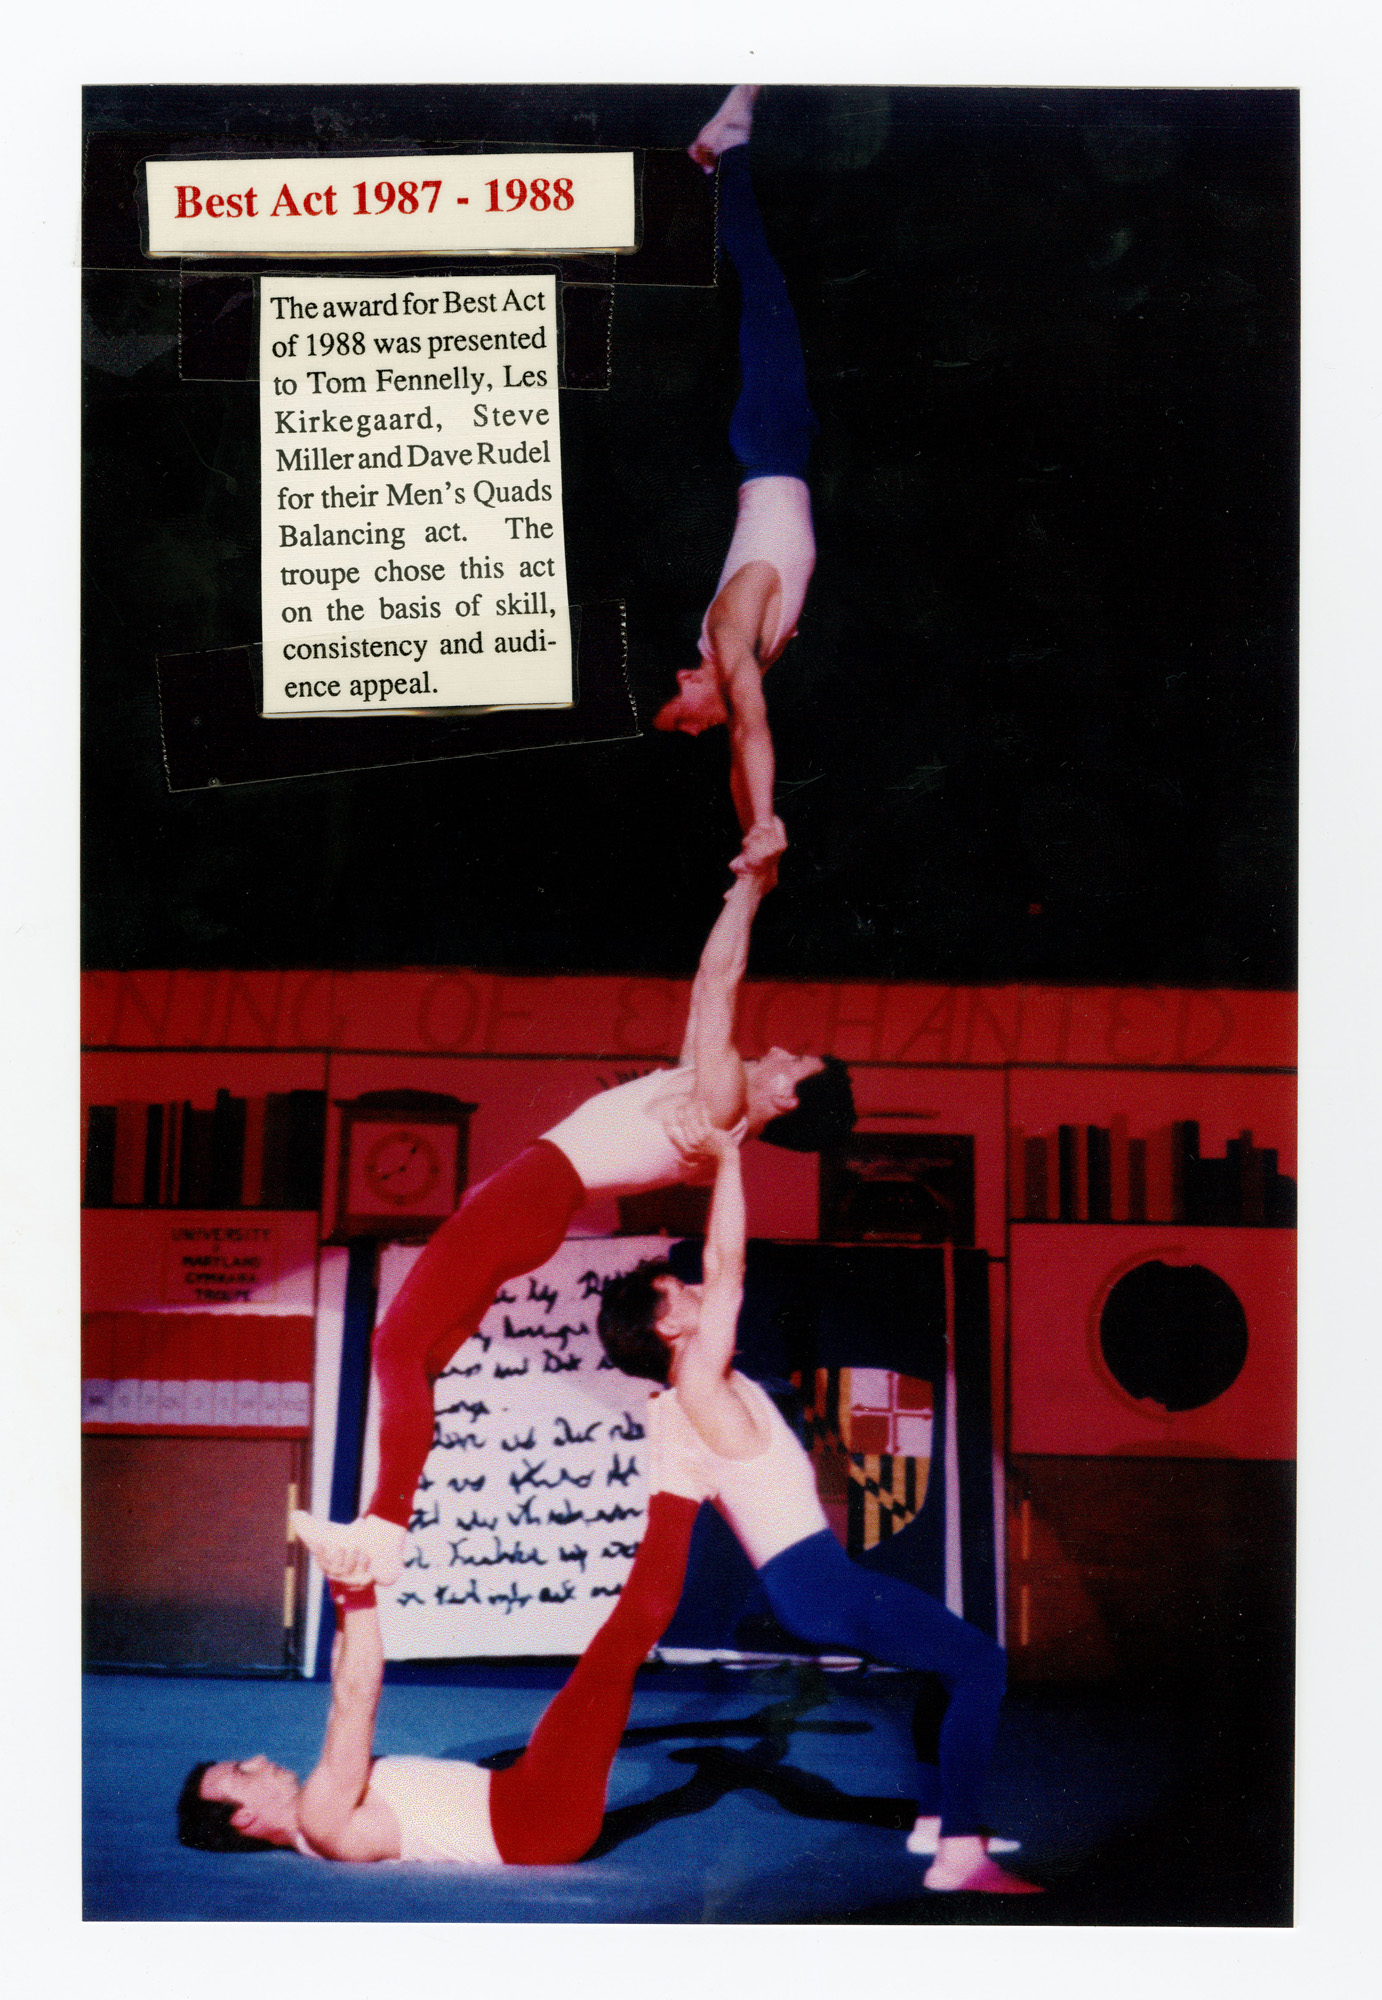 1988 - Men's Quads Balancing